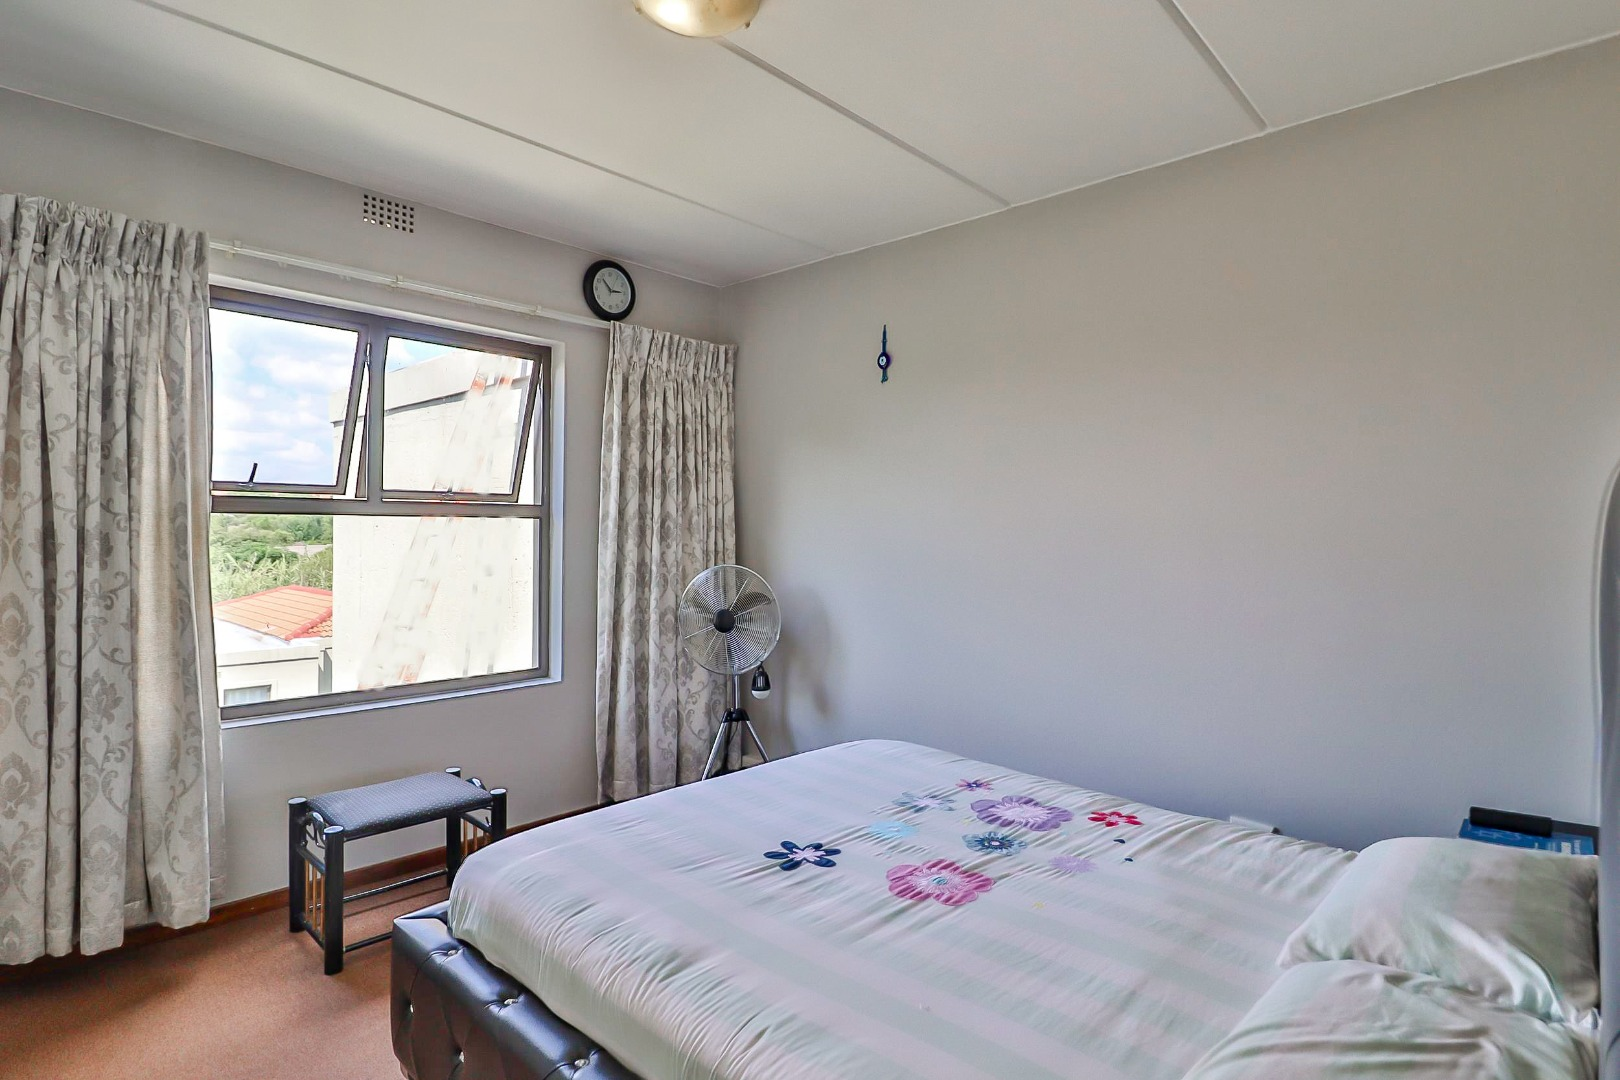 2 Bedroom Apartment / Flat For Sale in Broadacres